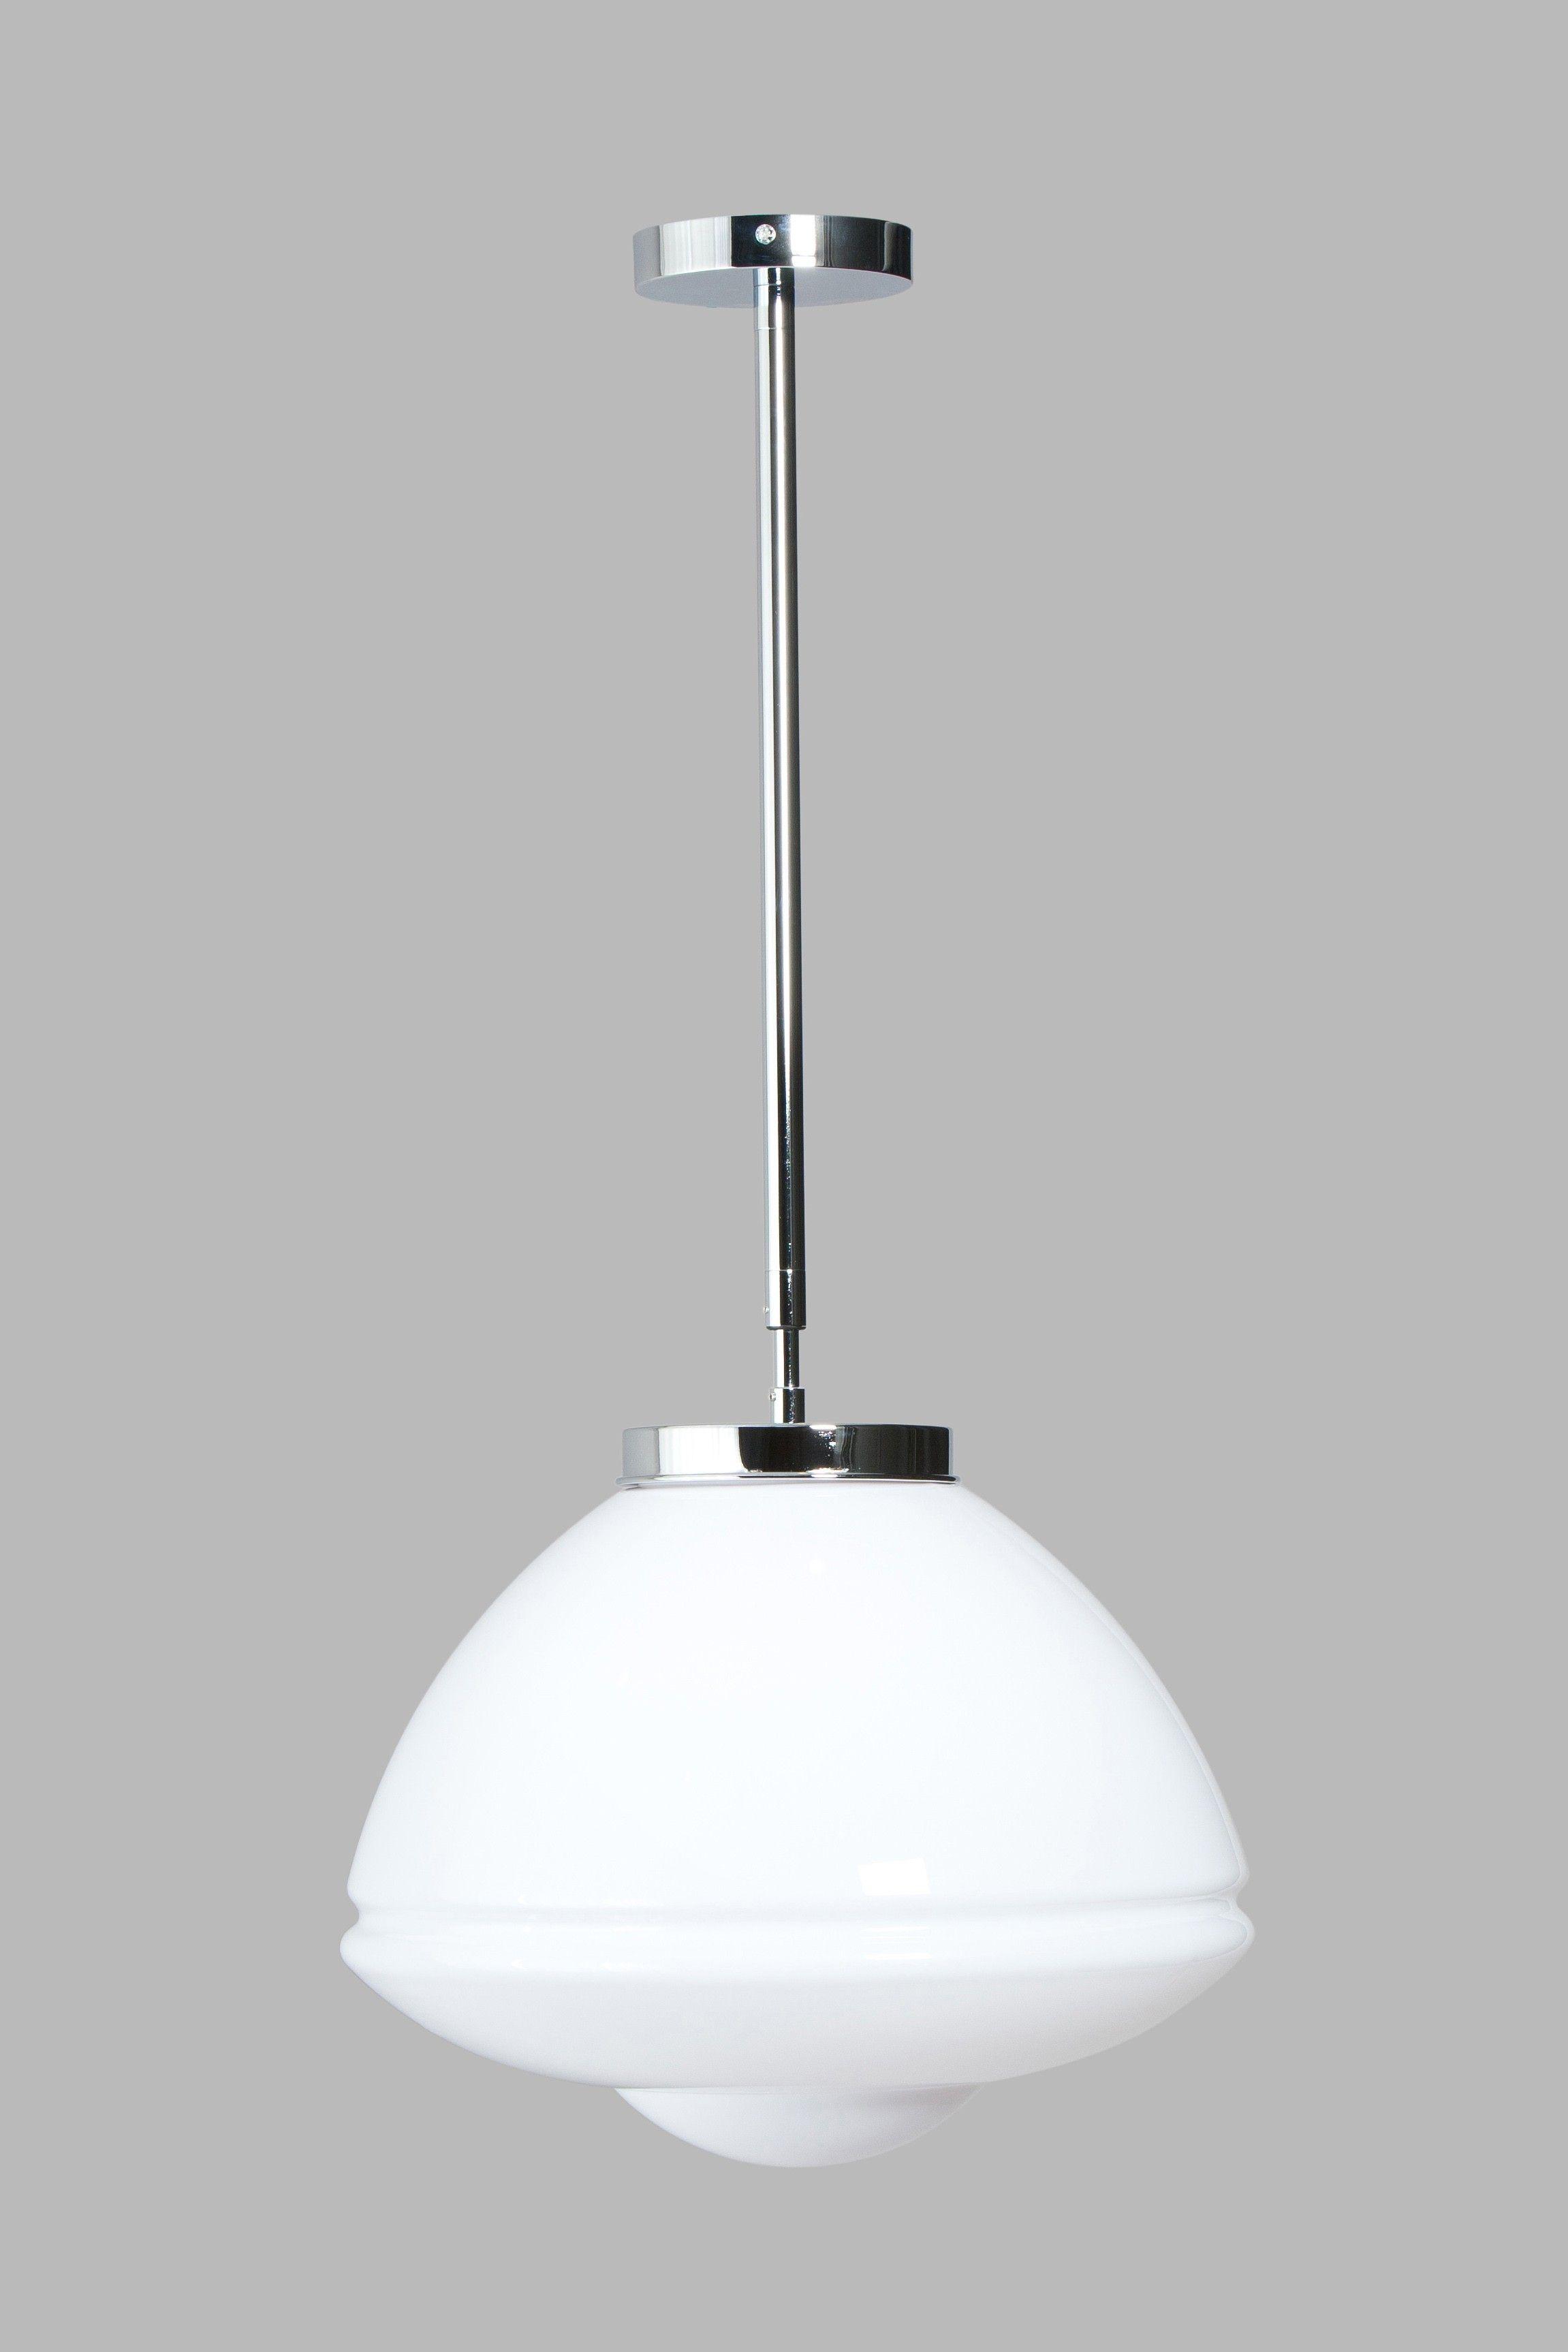 Lamps on pinterest